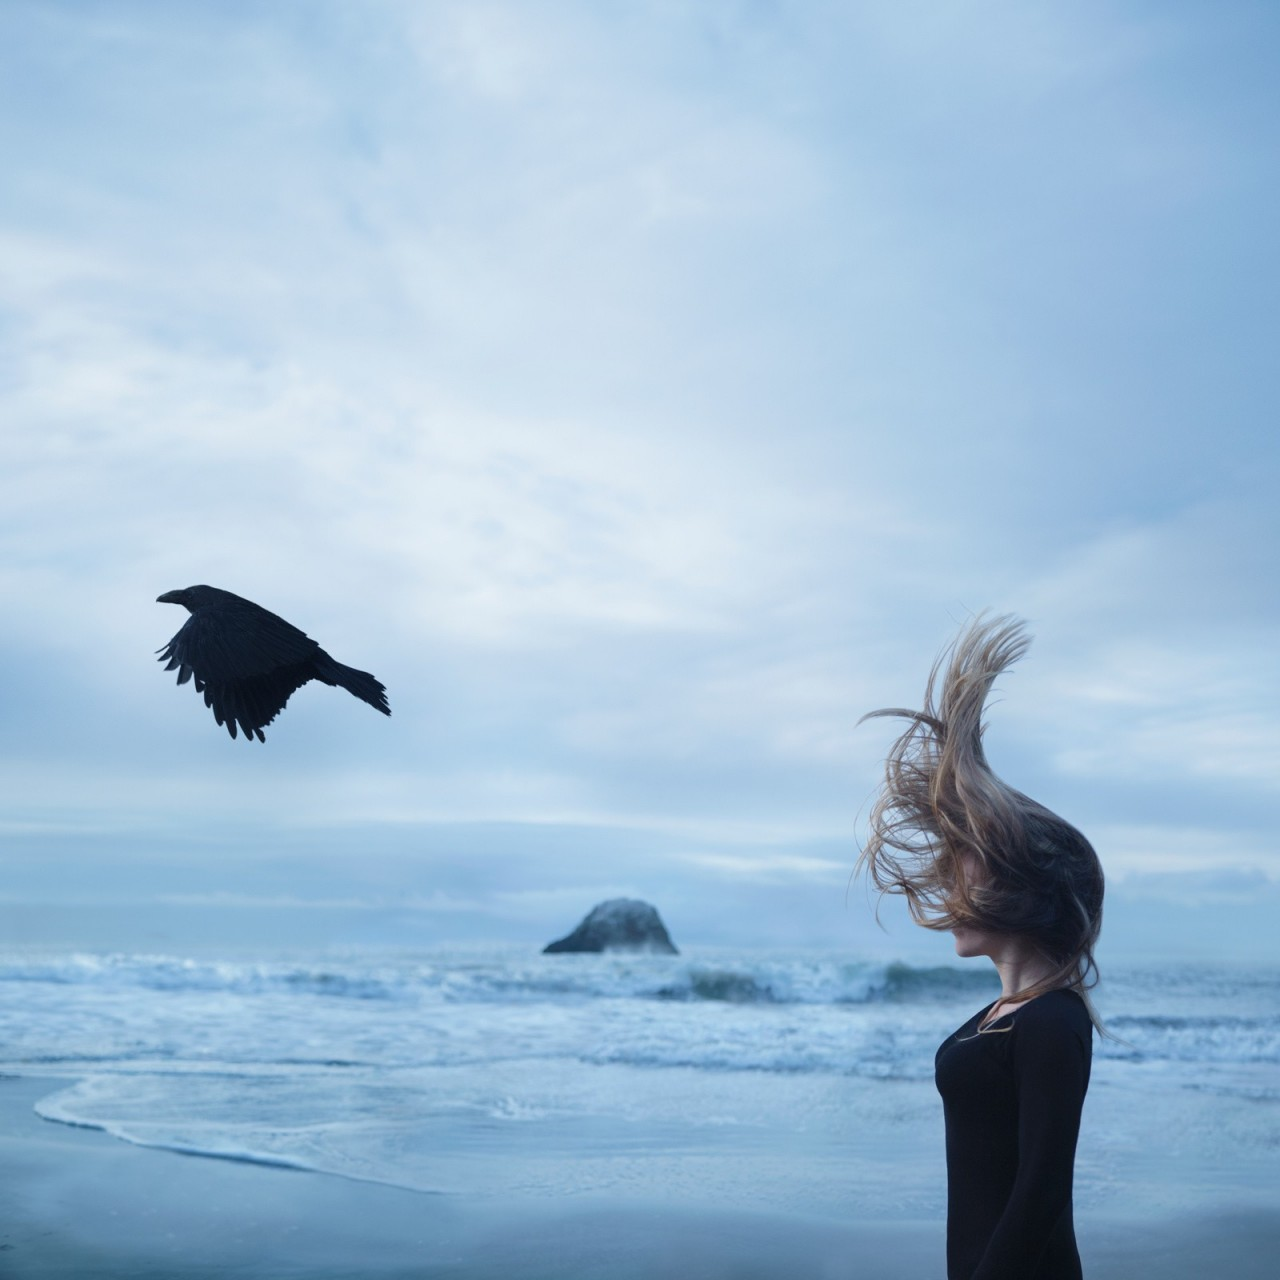 «Полёт». Автор Габриэль Исак